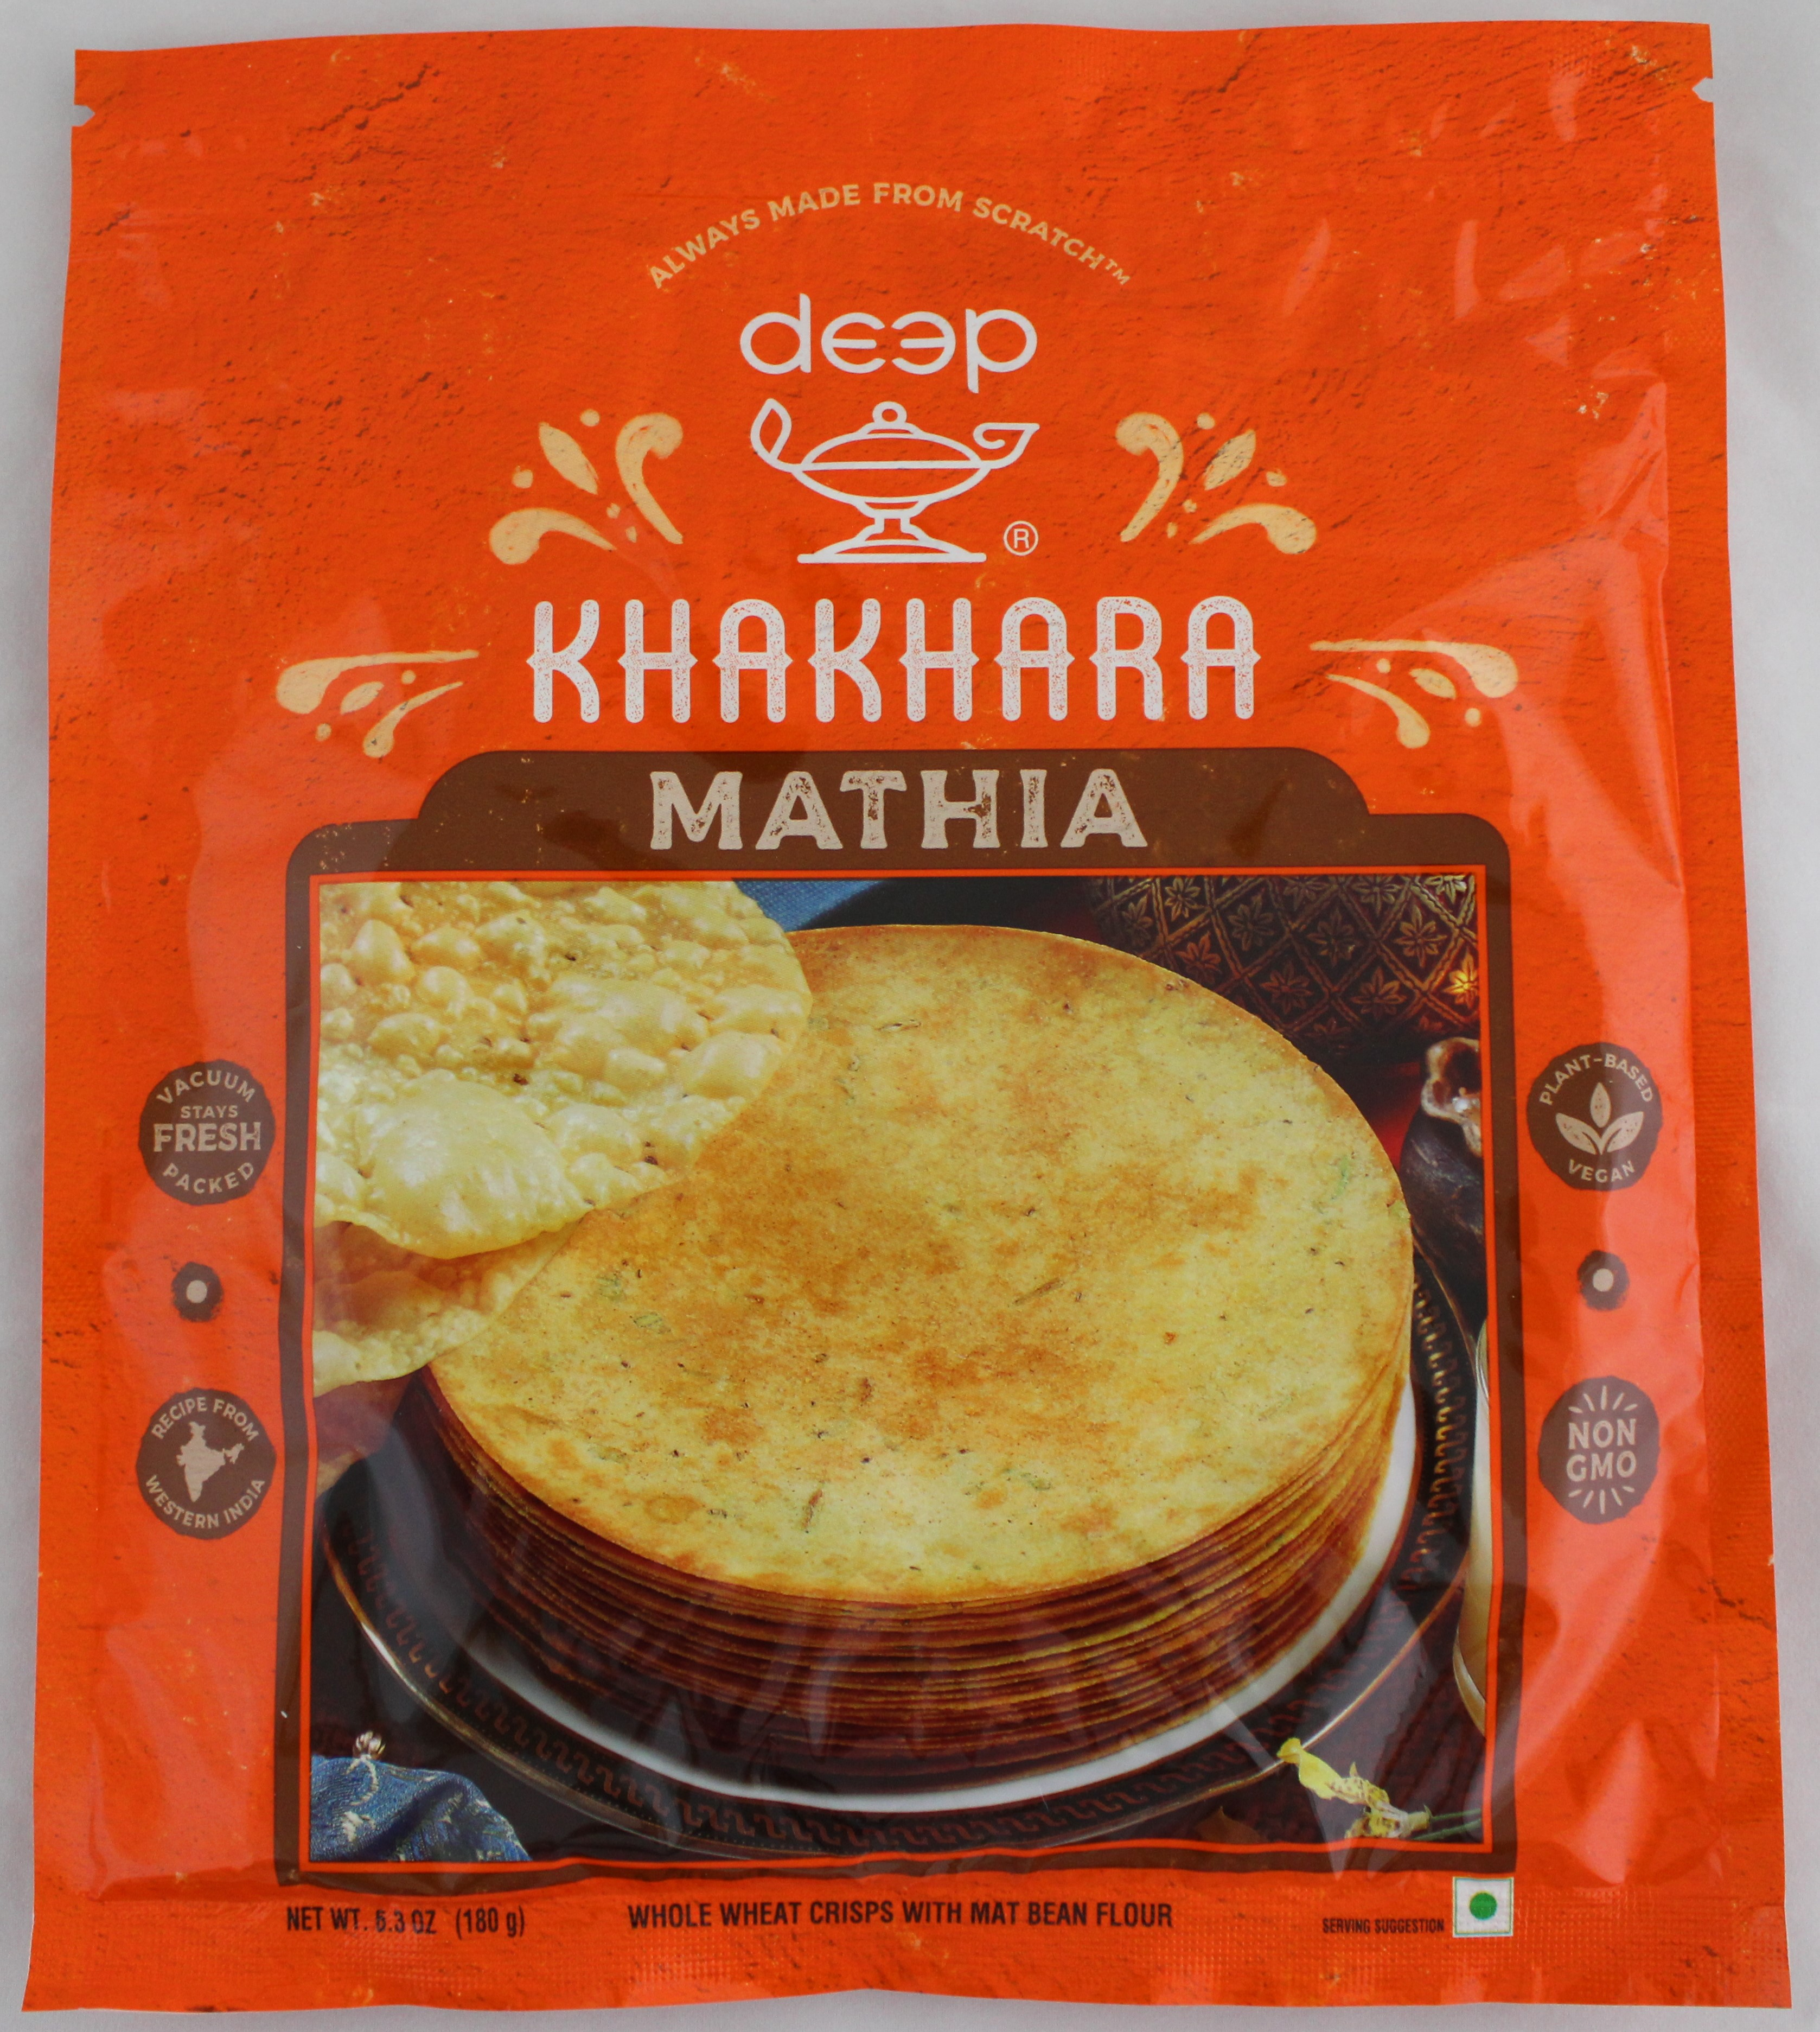 Mathia Khakhara 6.3 oz